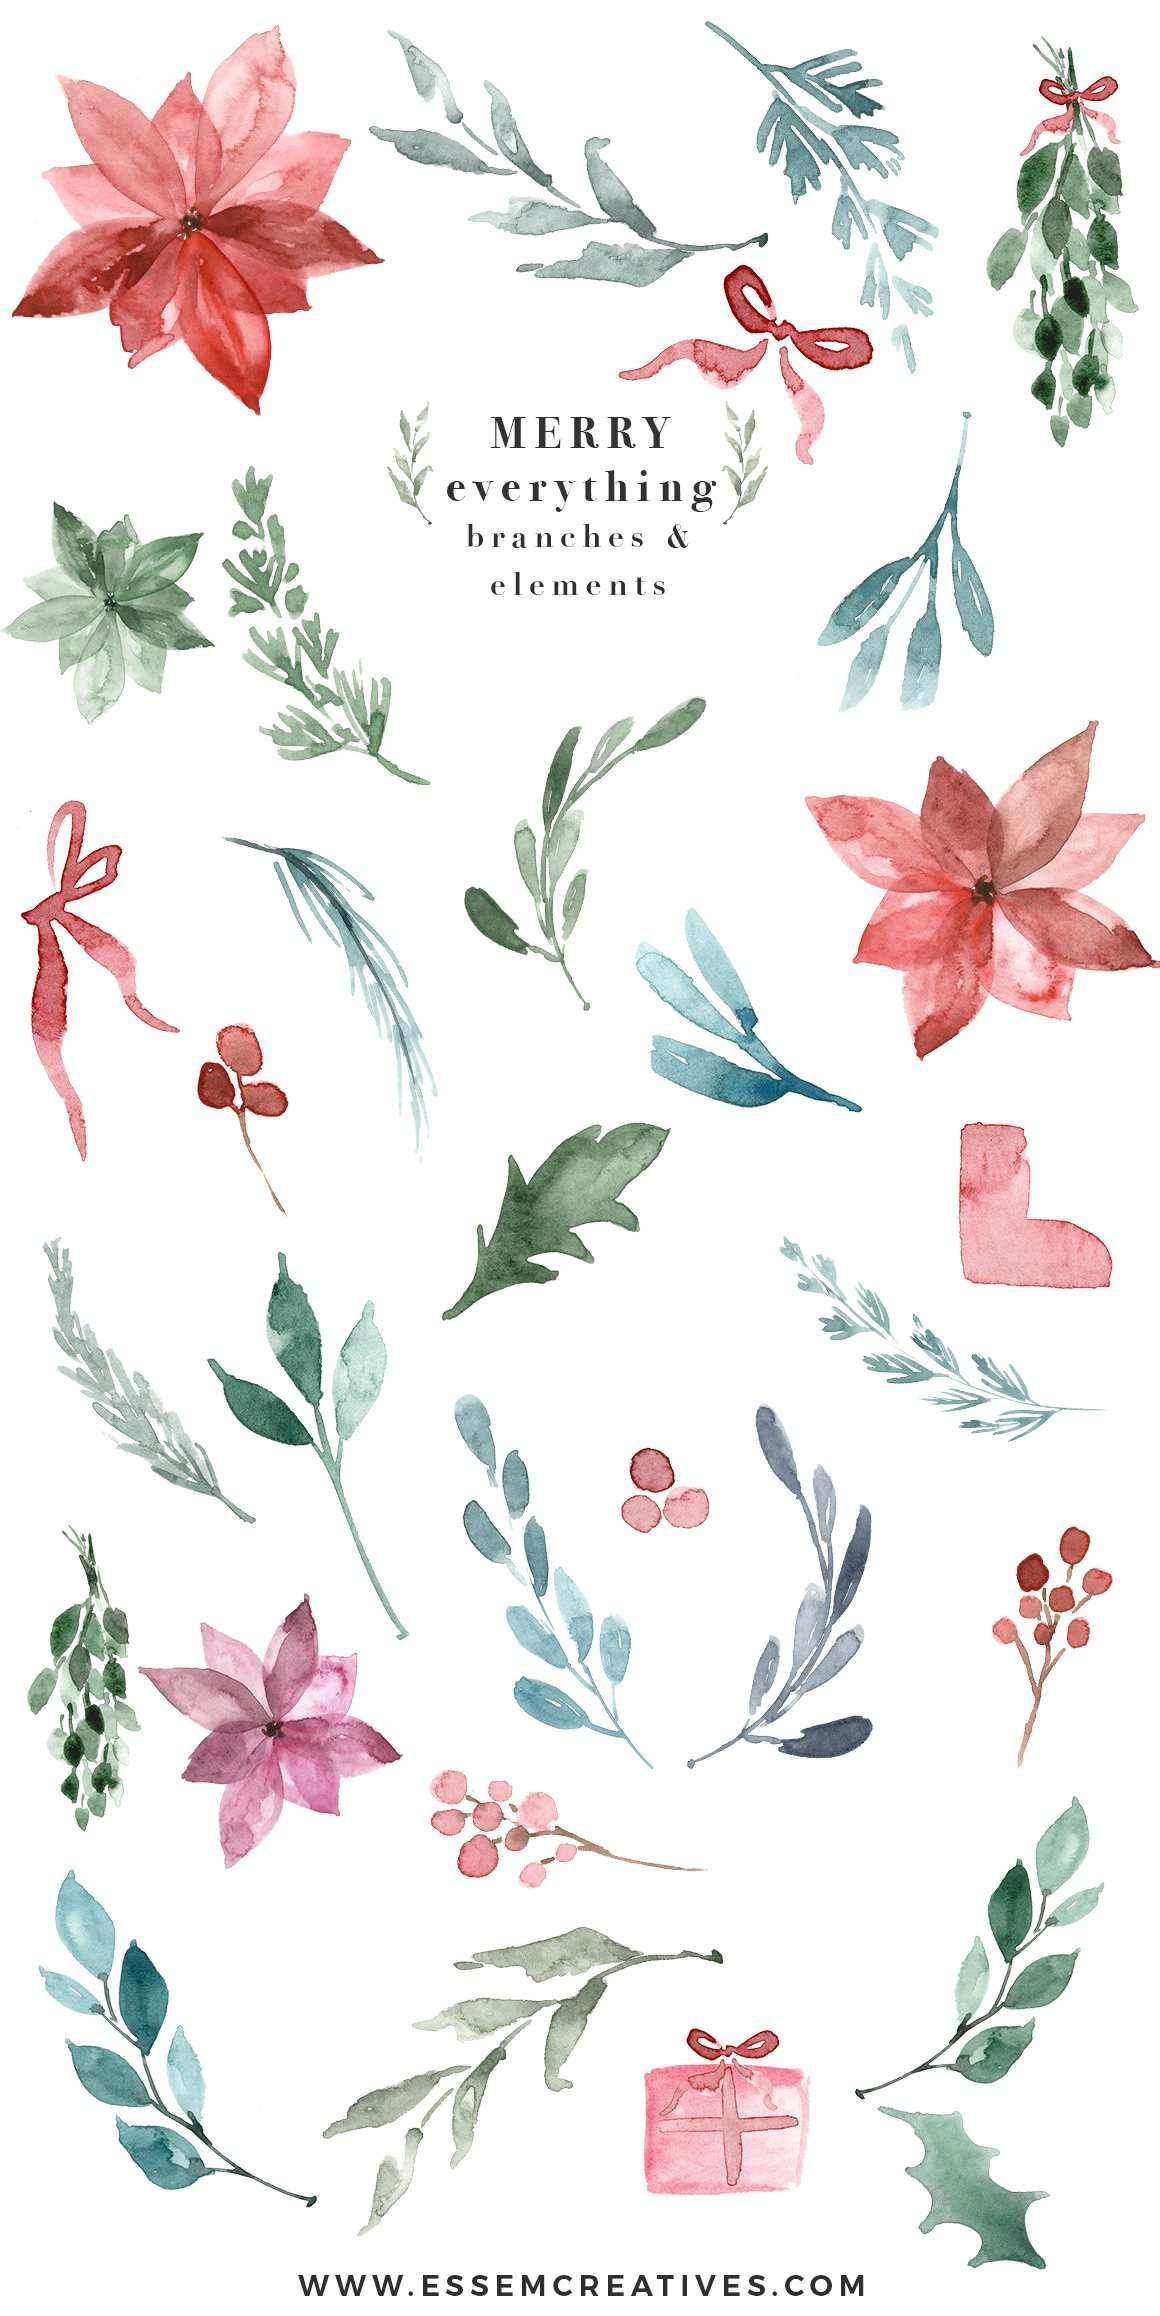 Watercolor Christmas Card Template Christmas Wreath Clipart Mistletoe